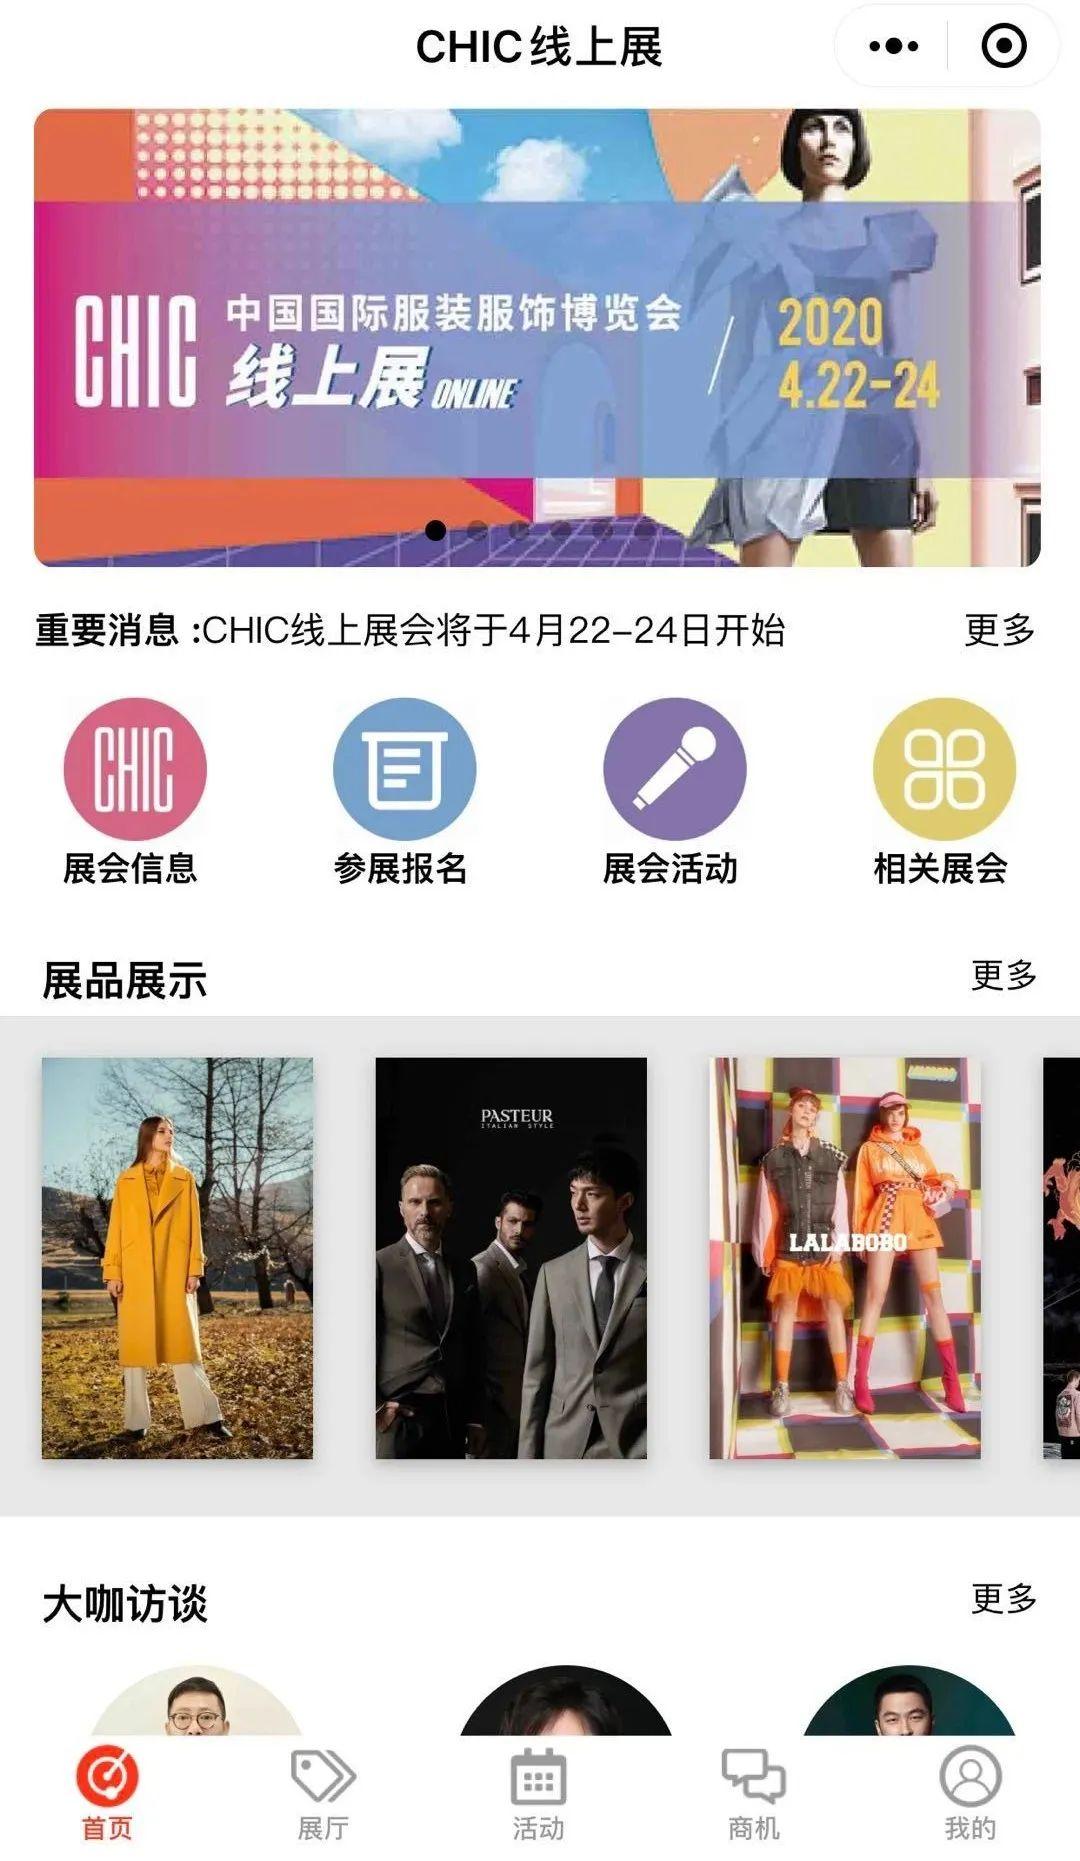 chic你好,别来无恙——中国国际服装服饰博览会线上展开幕